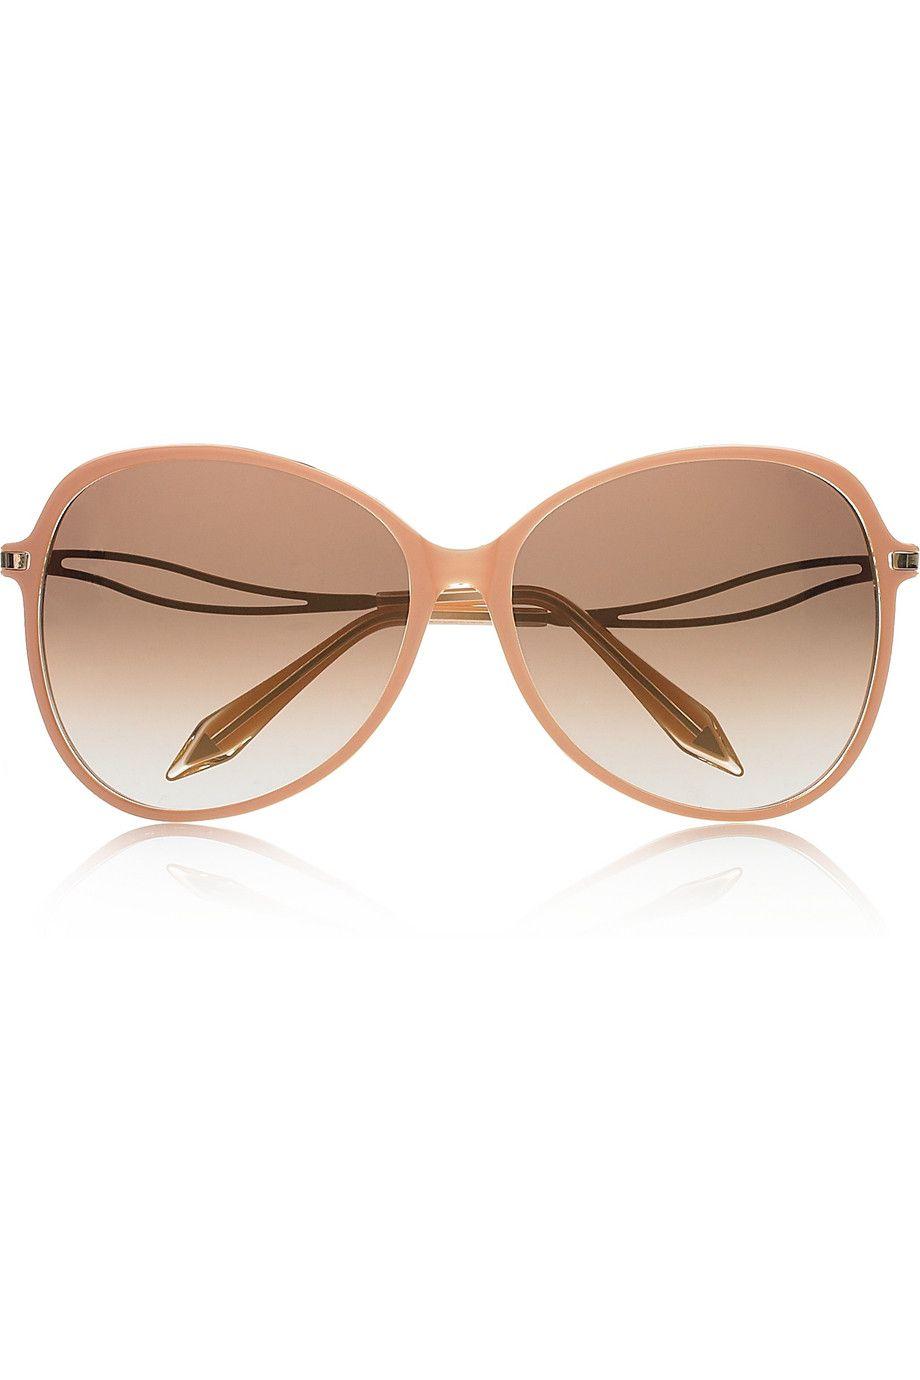 Victoria Beckham Butterfly D-frame Accoutrement, Victoria Beckham,  Monocles, Lunettes De Soleil a39dd2b336b1